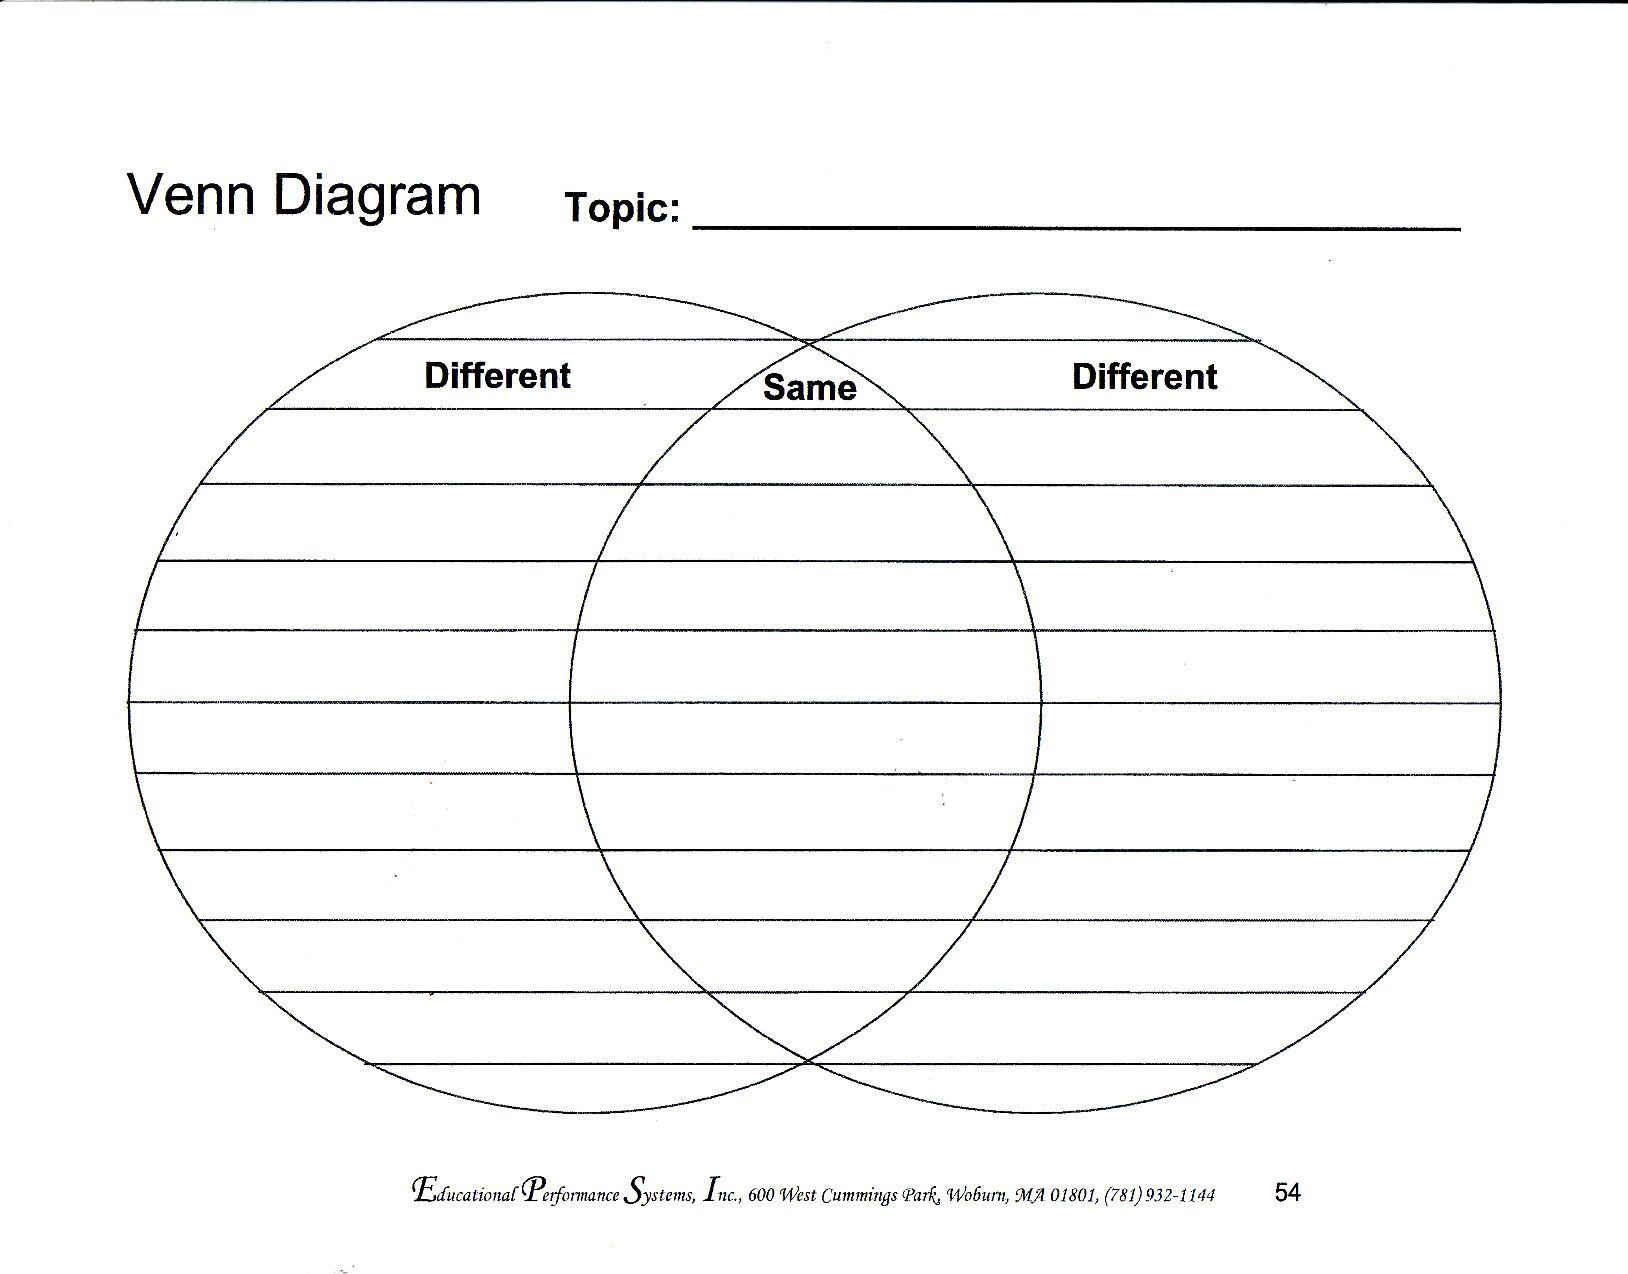 venn diagram math division control wiring of vfd 1st grade language log  with